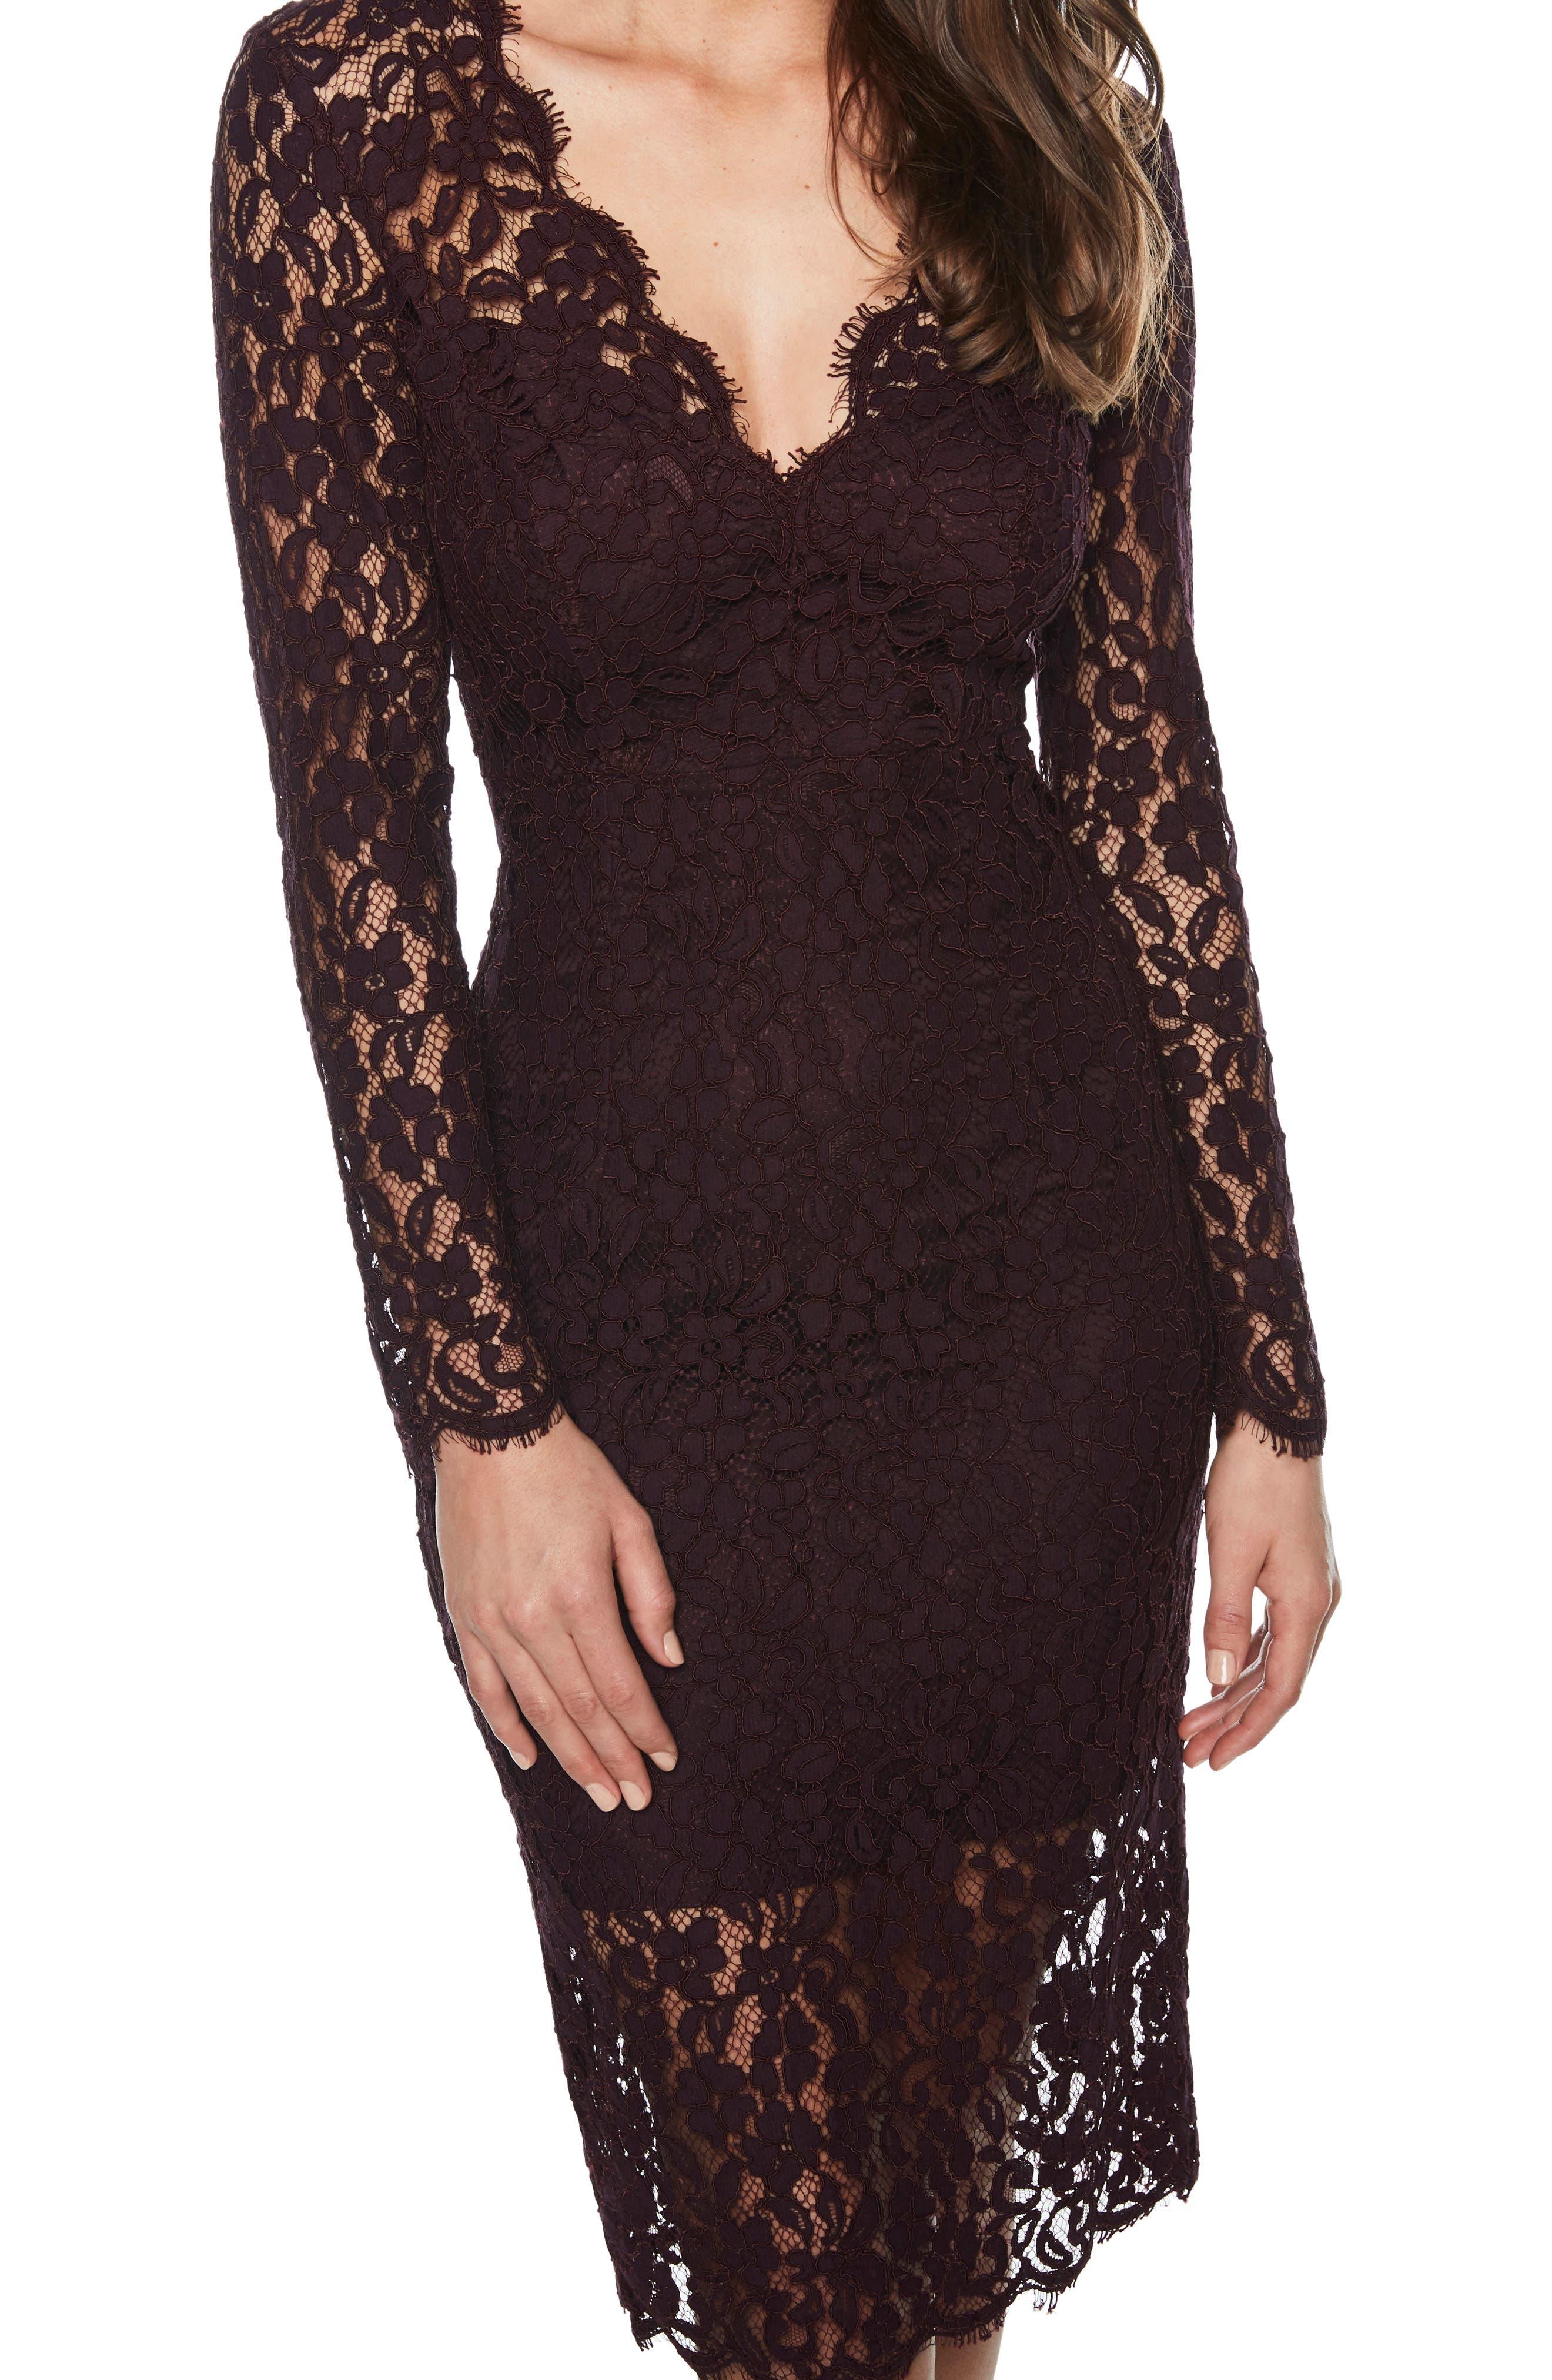 BARDOT,                             Midnights Lace Dress,                             Alternate thumbnail 4, color,                             BLACK